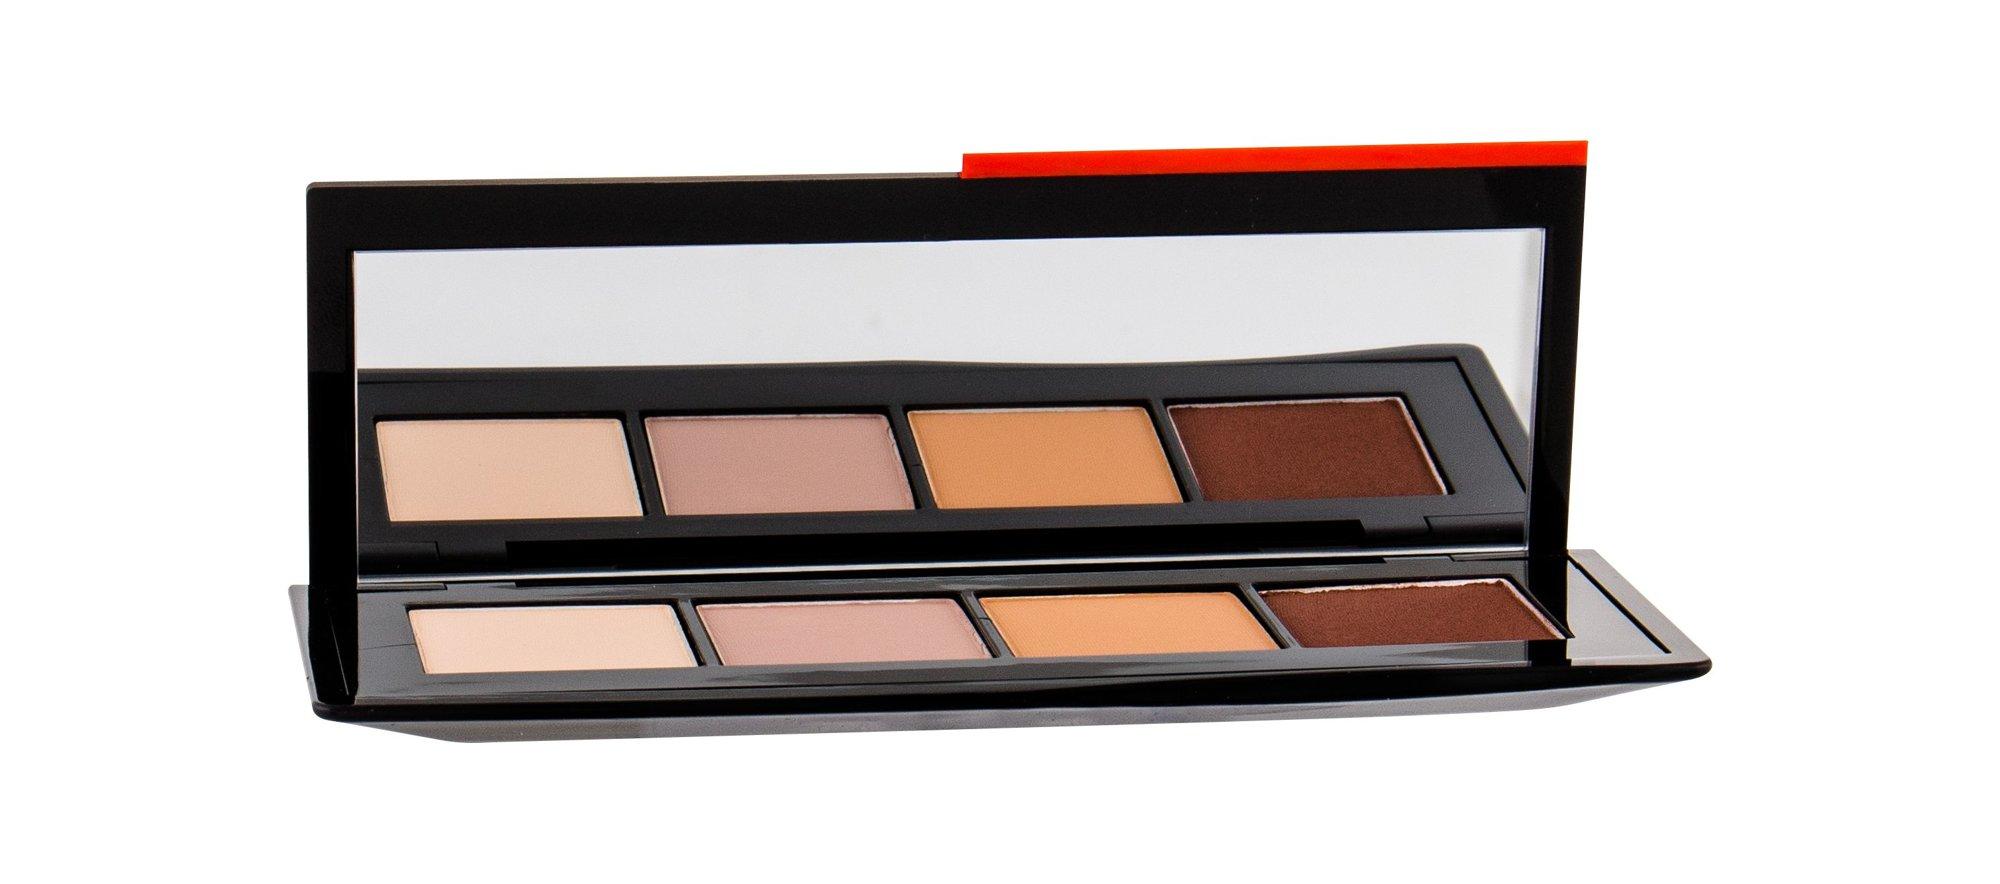 Shiseido Essentialist Eye Palette Eye Shadow 5,2ml 01 Miyuki Street Nudes